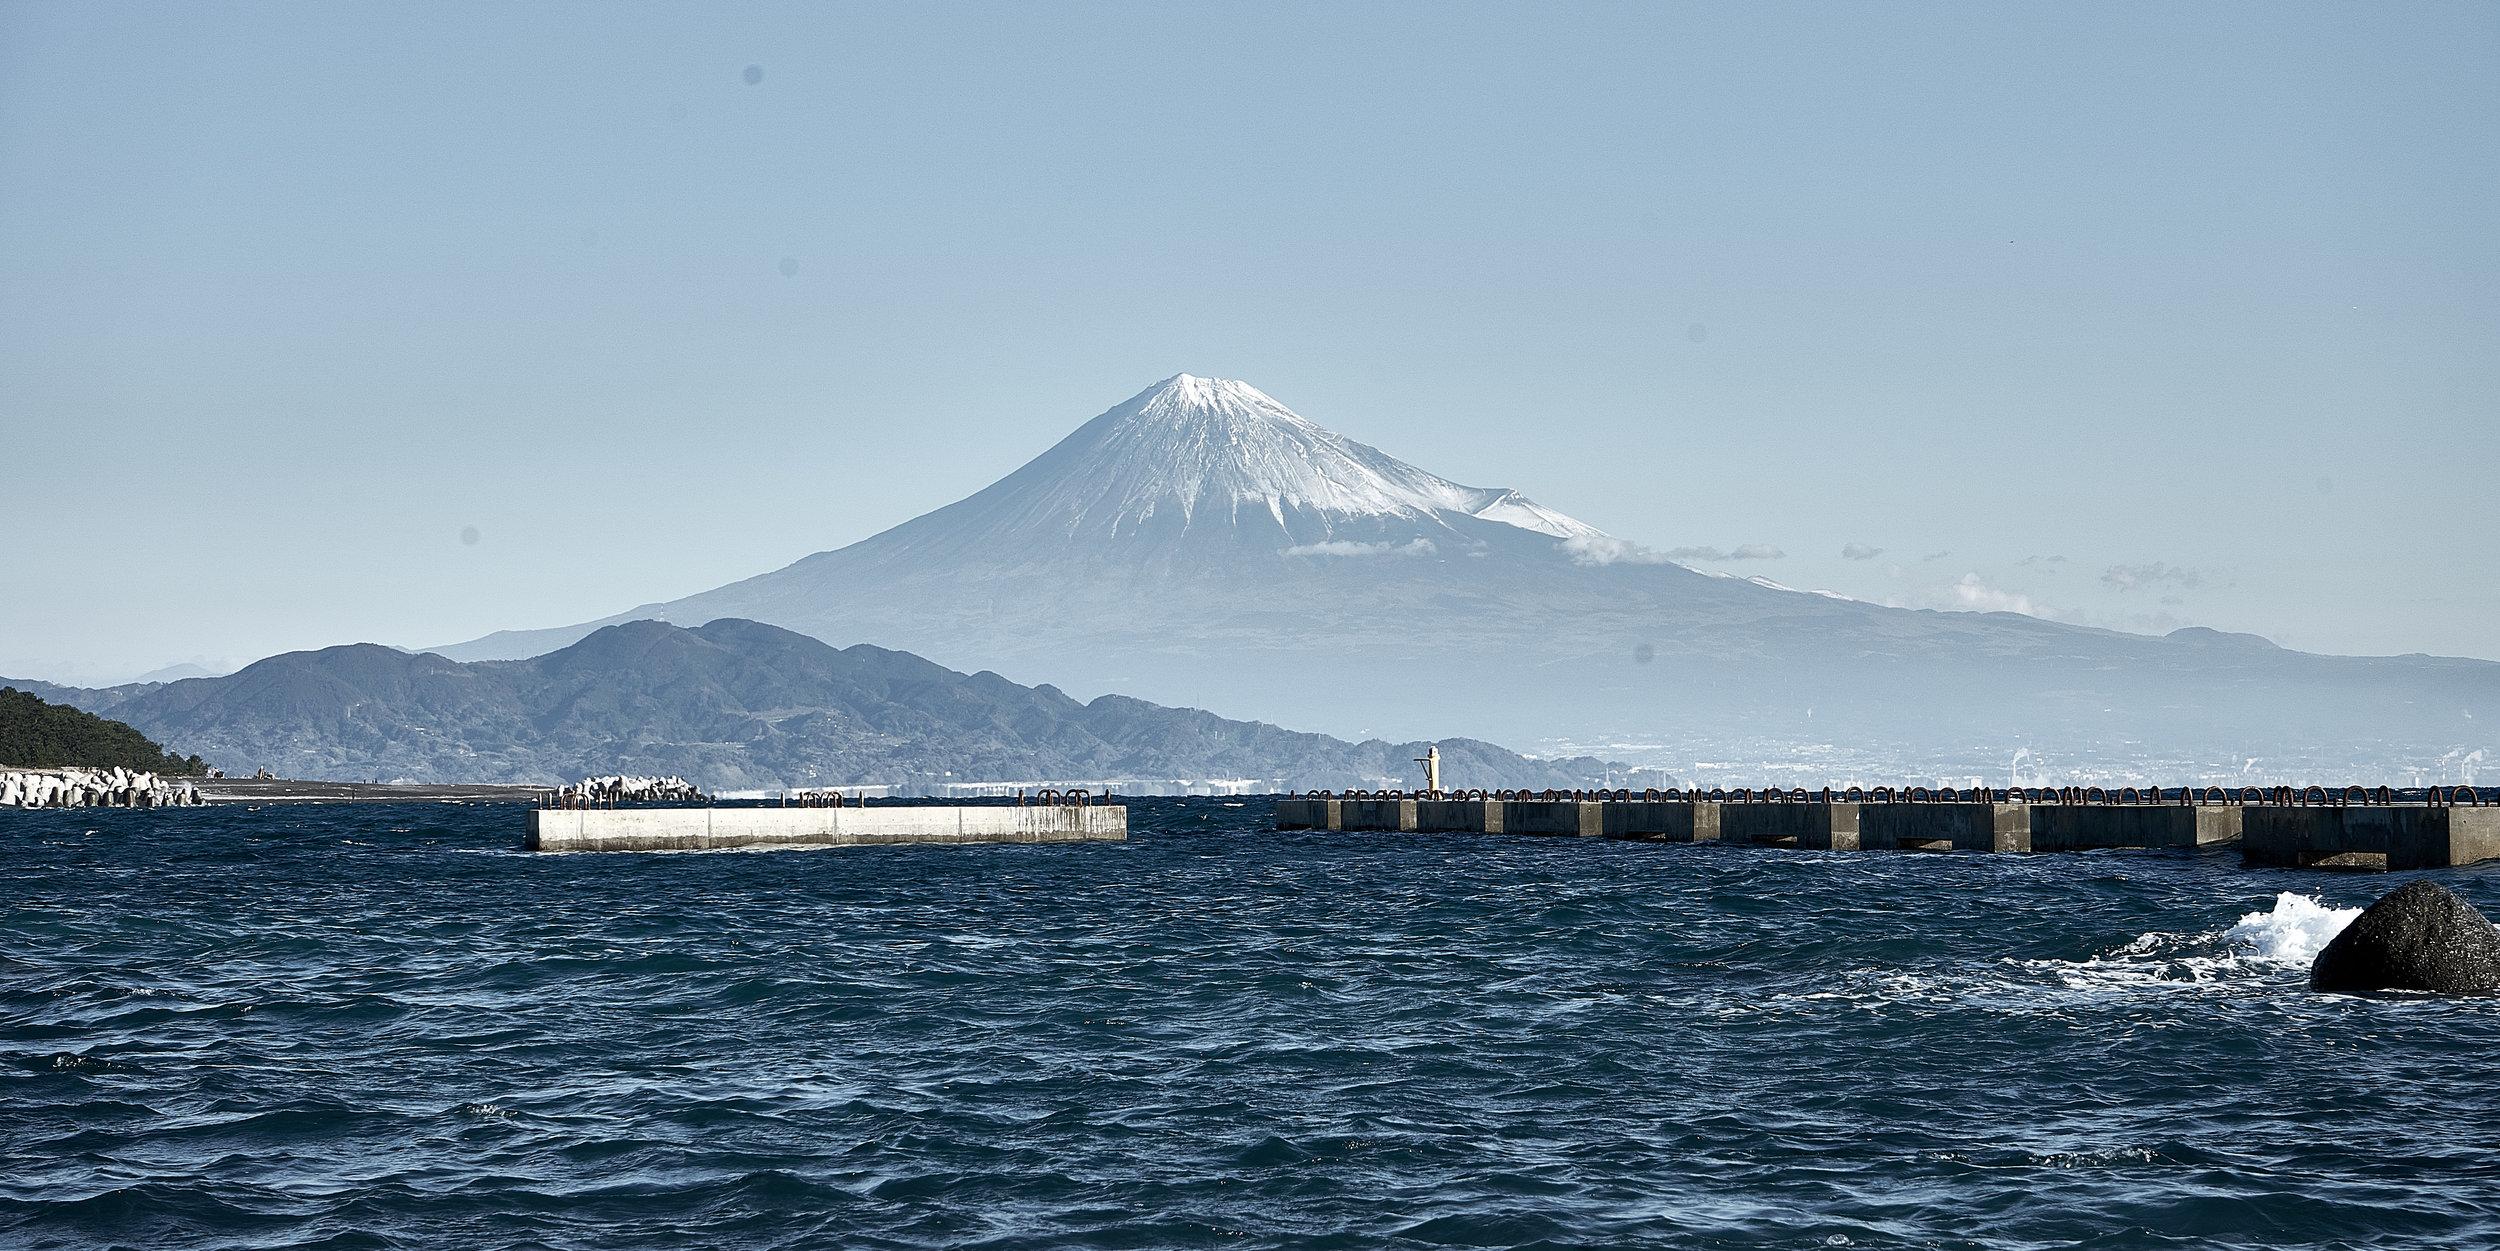 Mt. Fuji taken from Miho no Matsubara, Shizuoka, Japan (November 2018)